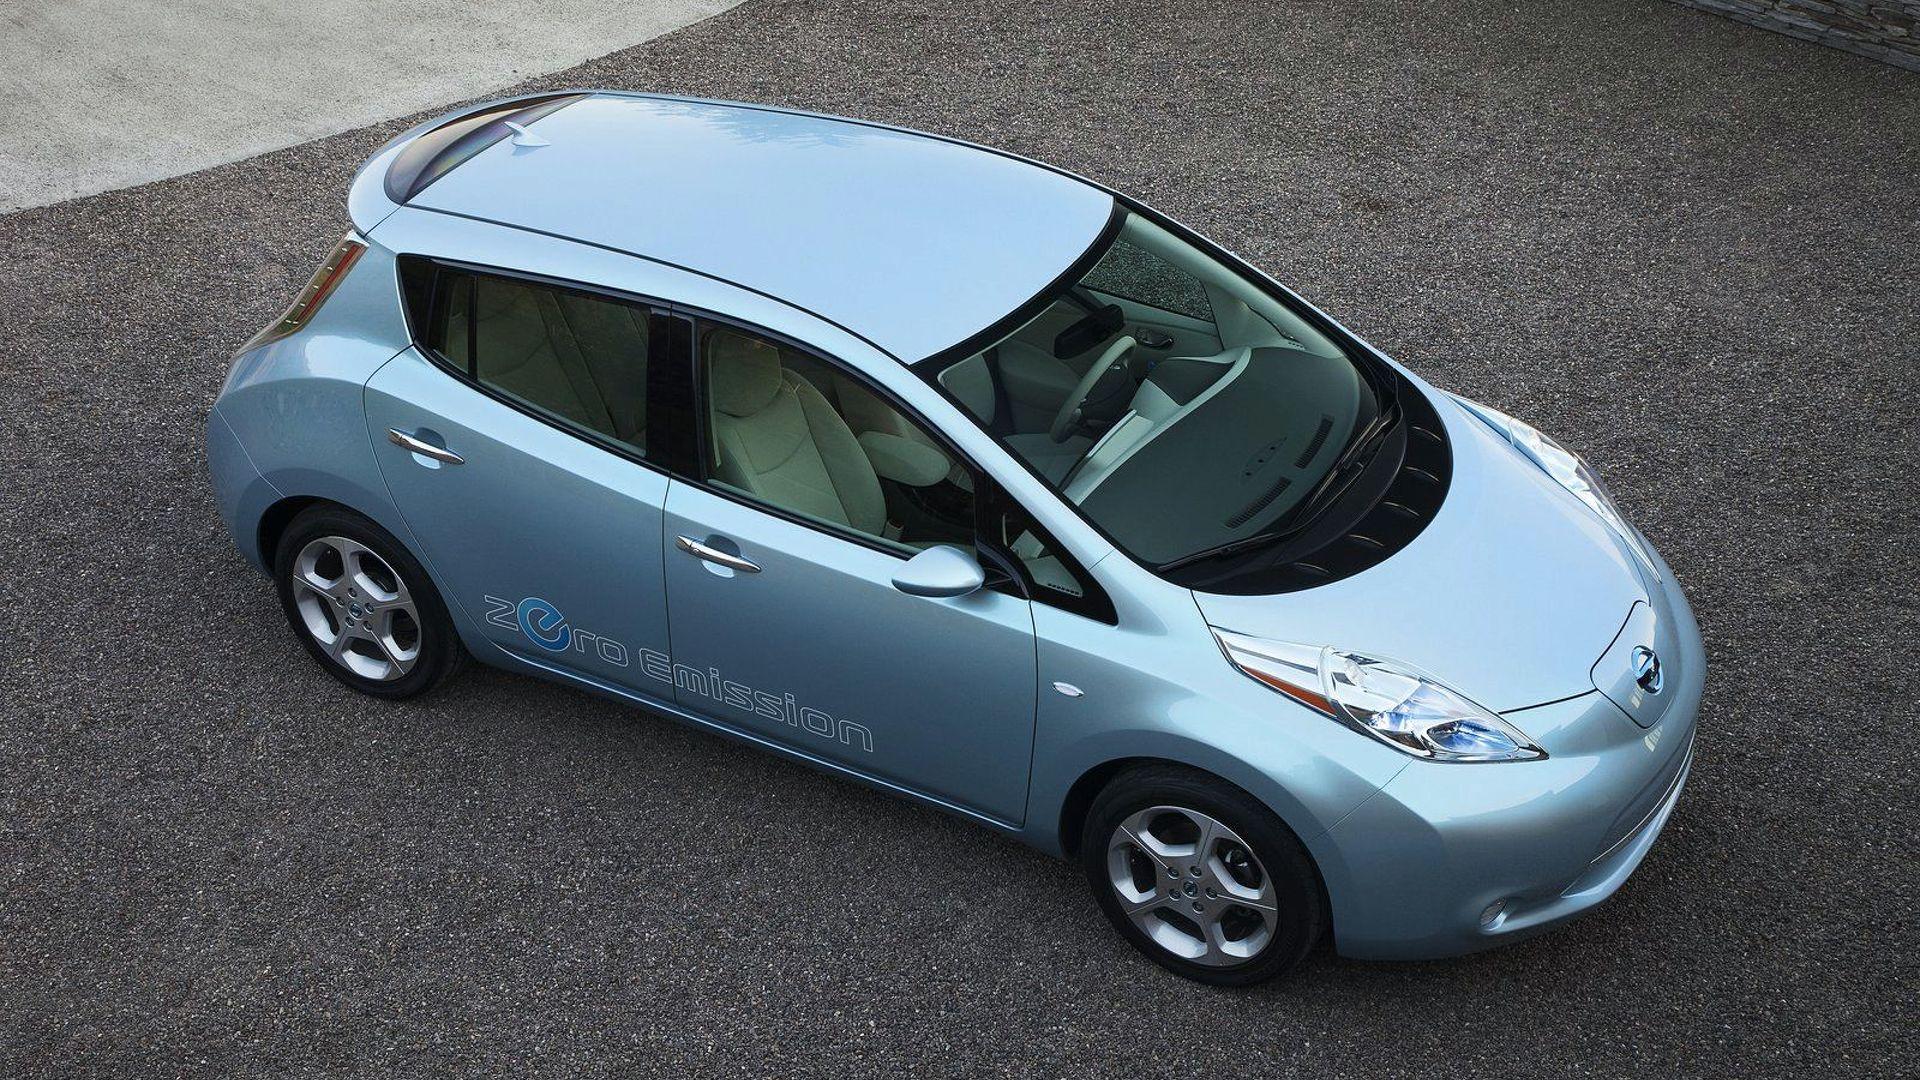 Infiniti rejects Nissan Leaf EV styling for own model range